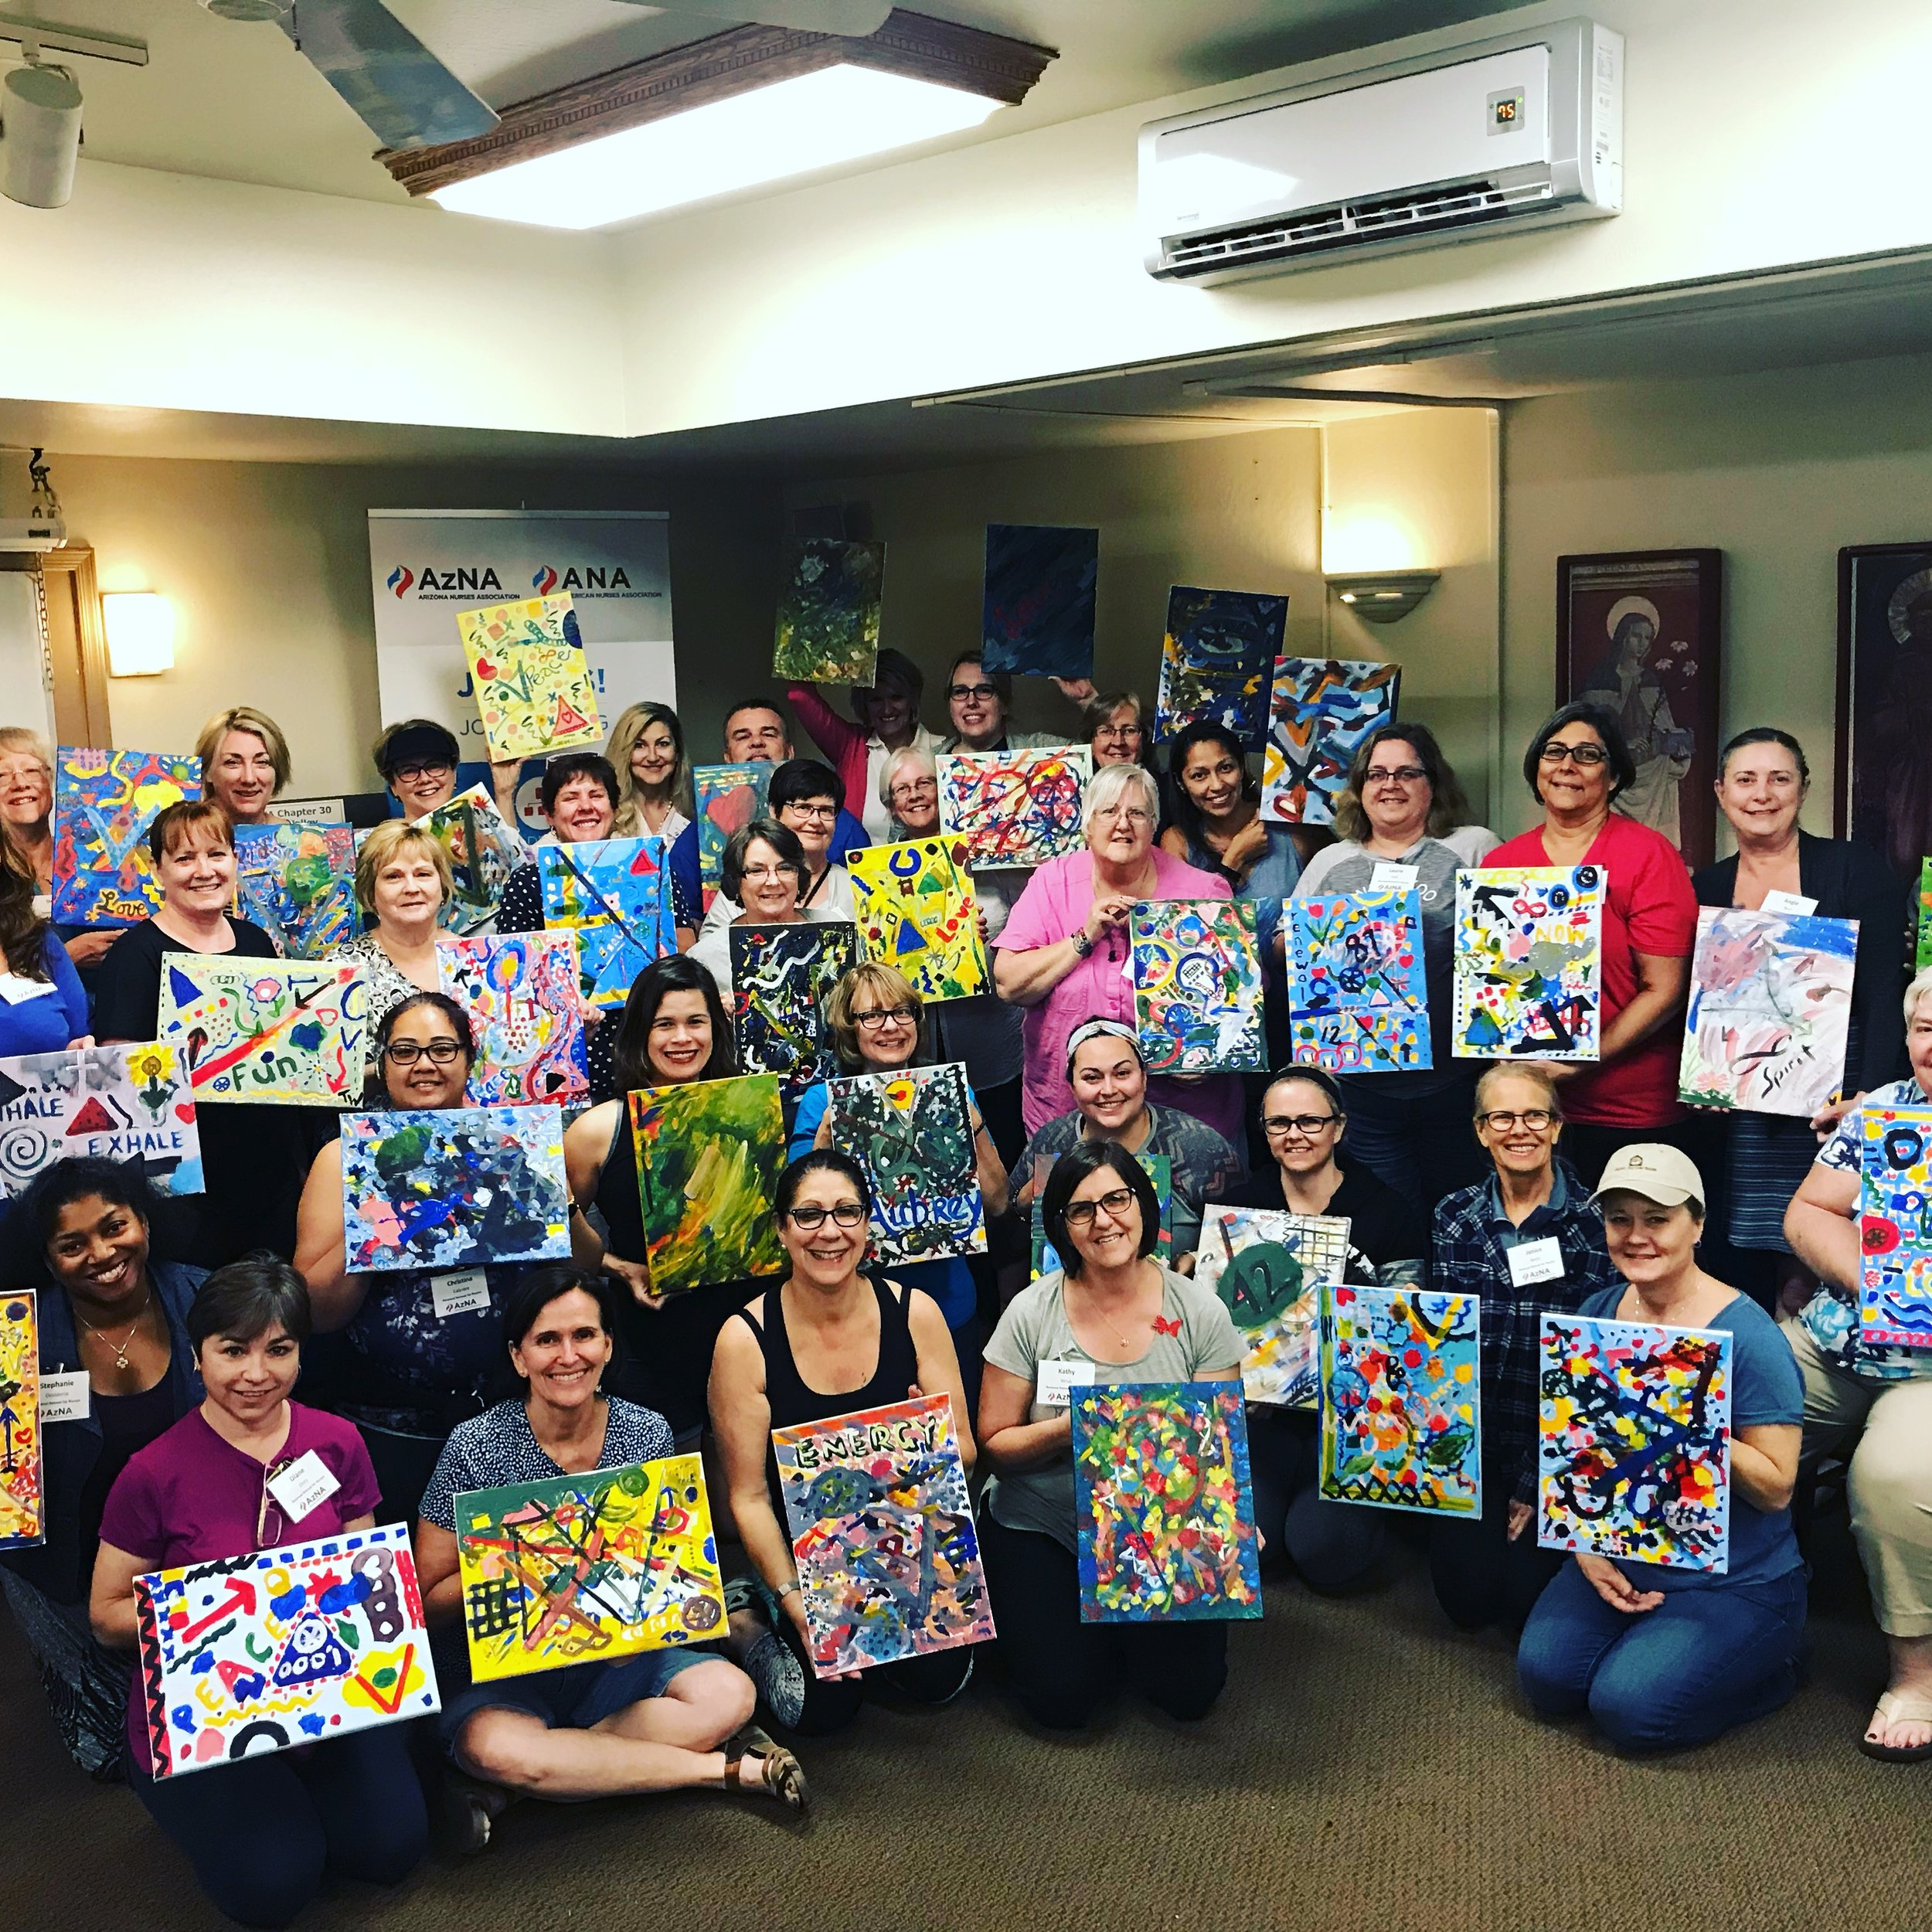 Arizona Nurses Association retreat paint party.